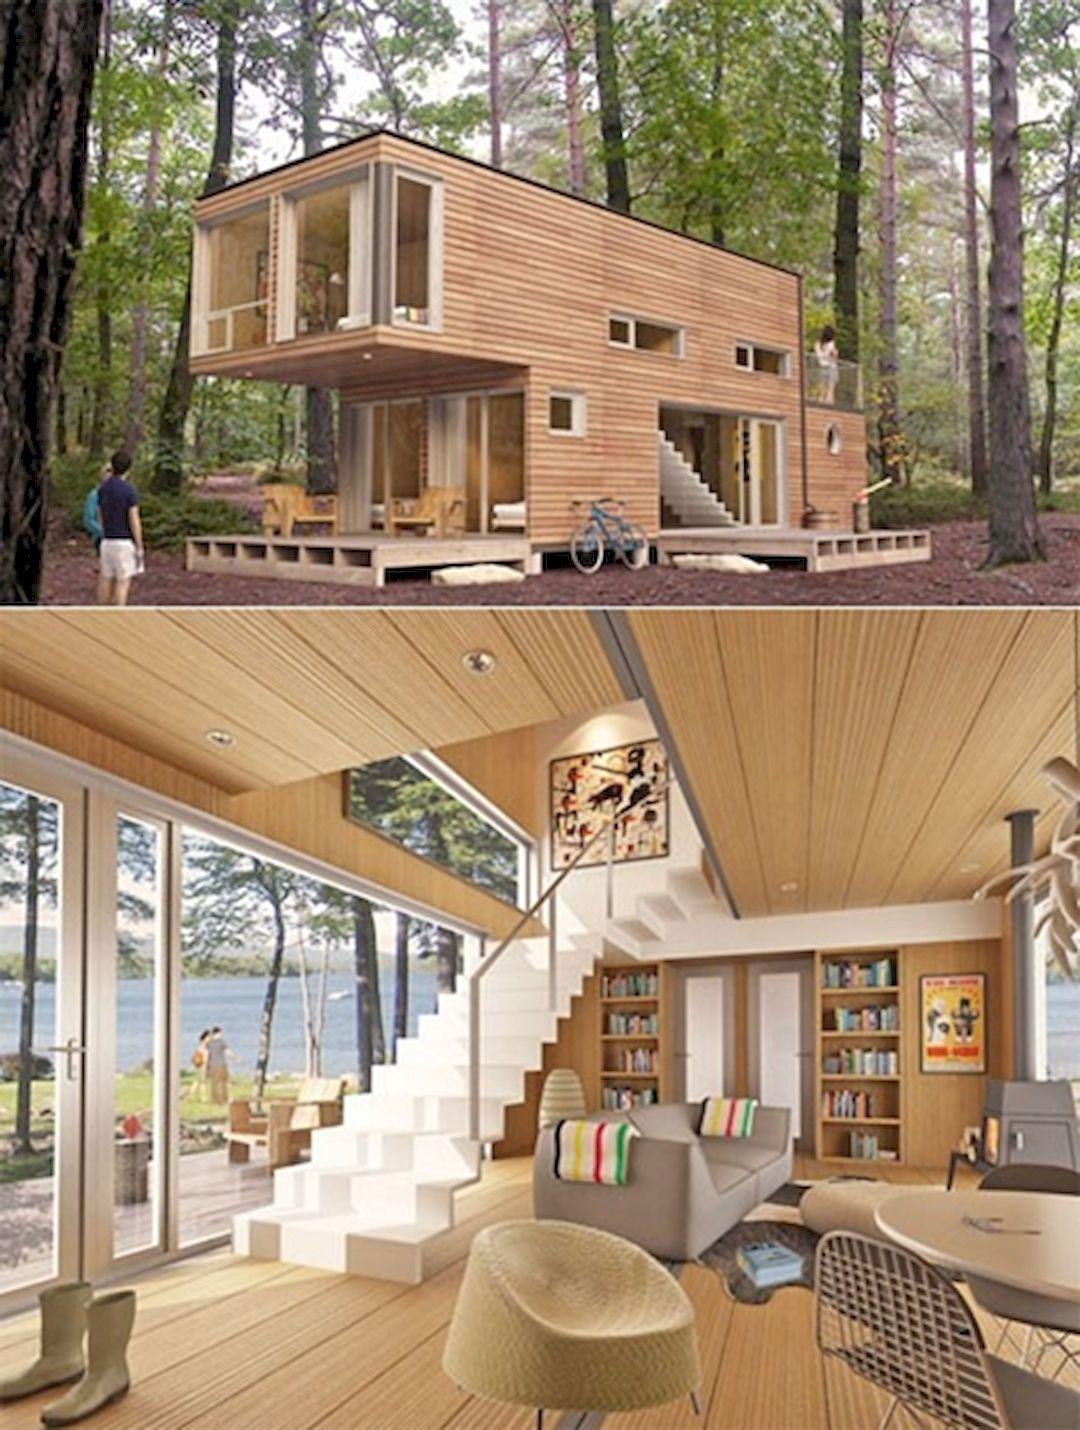 Genial House Design Inspiration: 115 Fantastic Modern Styles